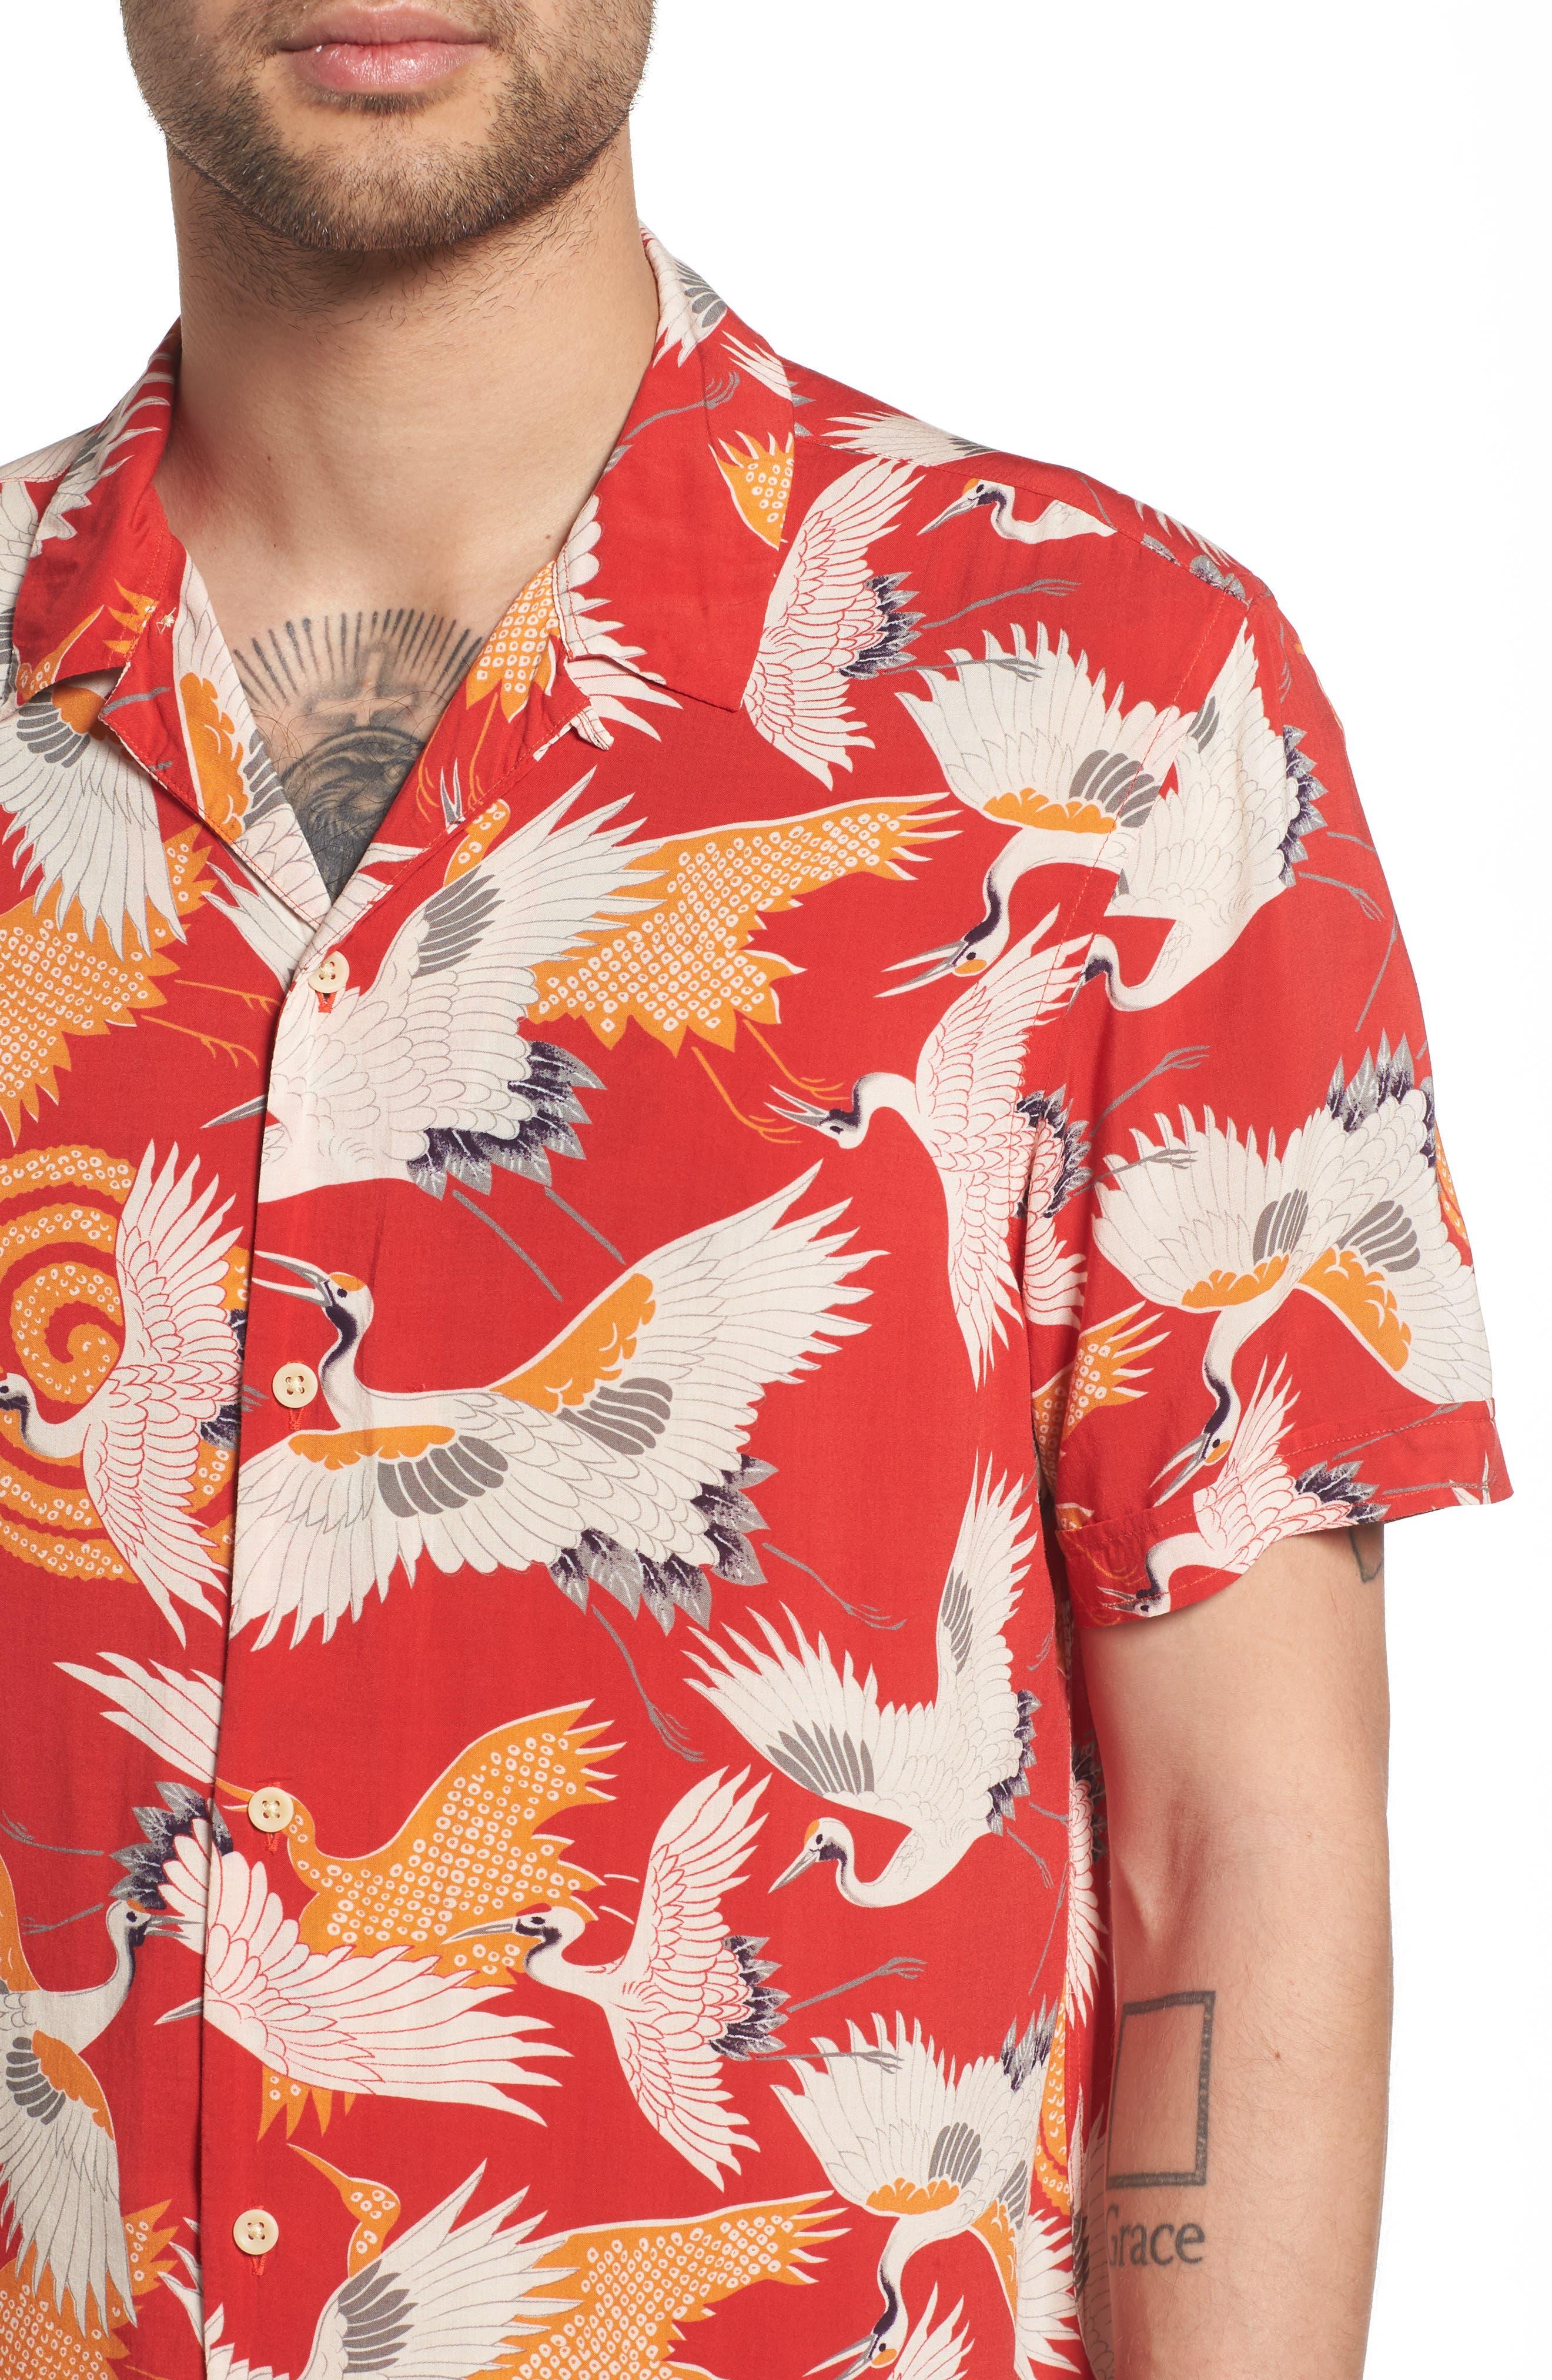 Tsuru Regular Fit Short Sleeve Sport Shirt,                             Alternate thumbnail 2, color,                             Red